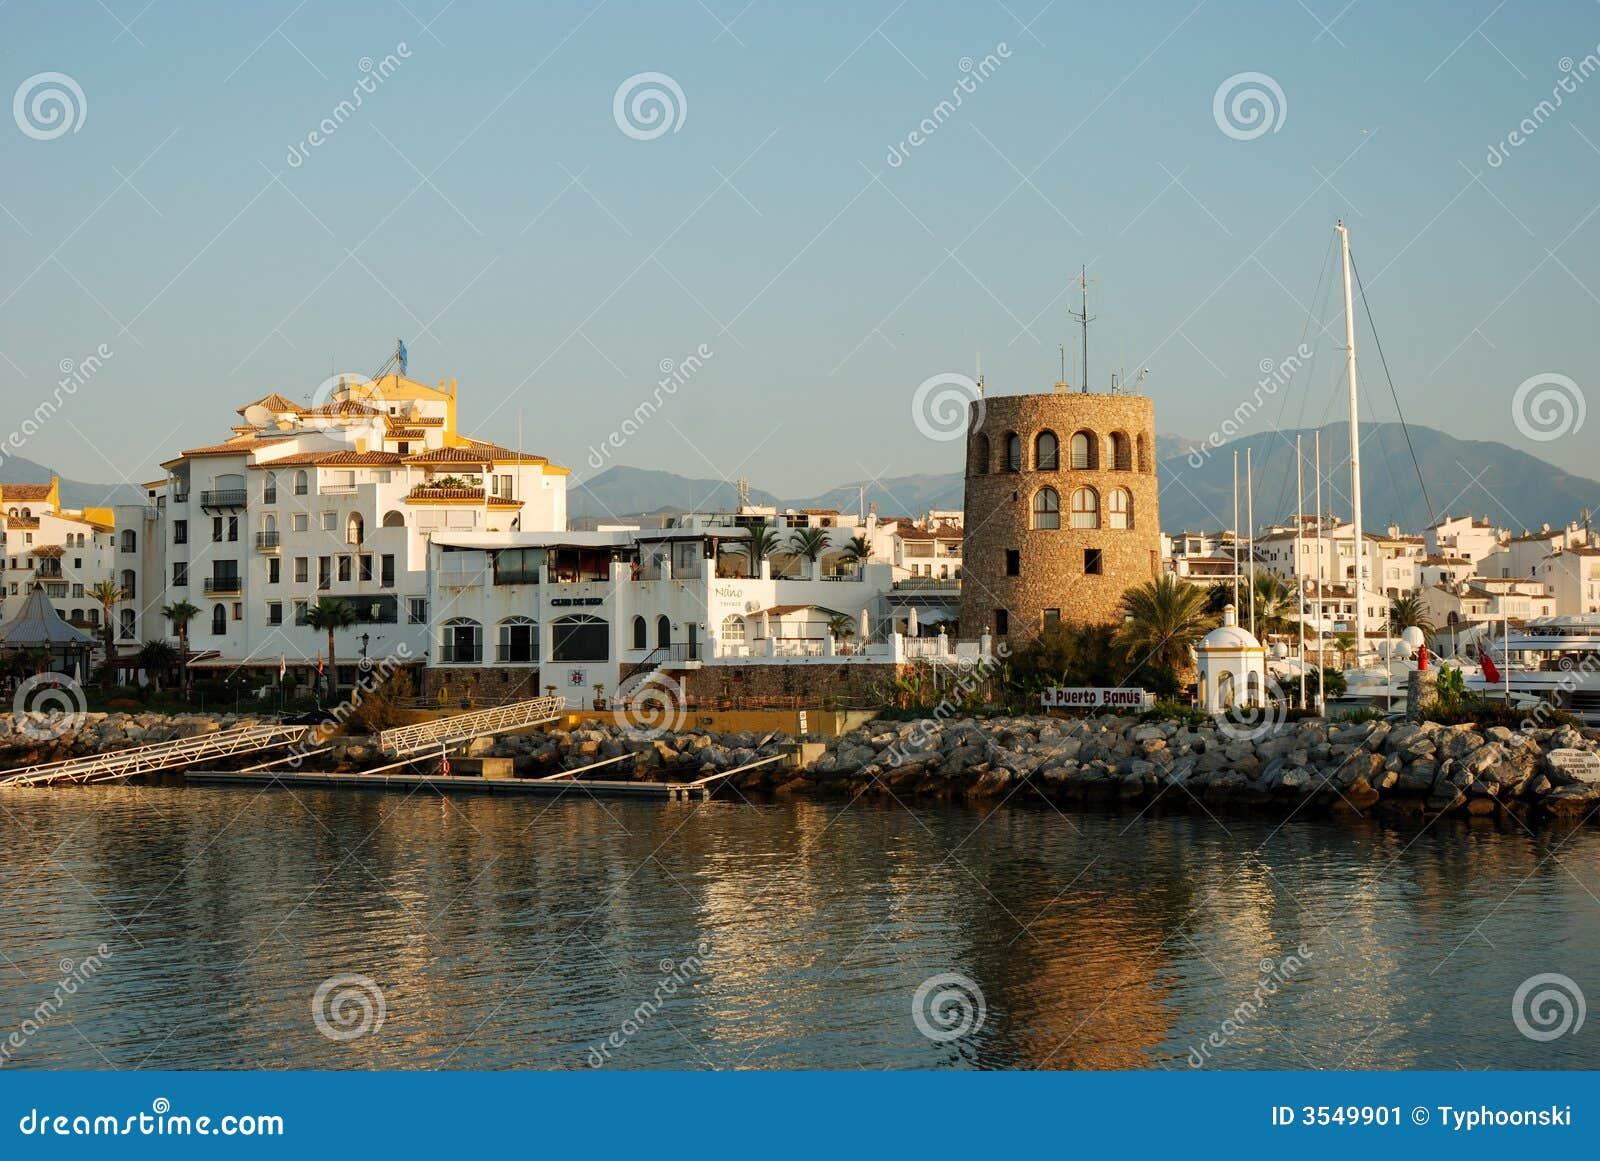 Banusmarbella puerto spain